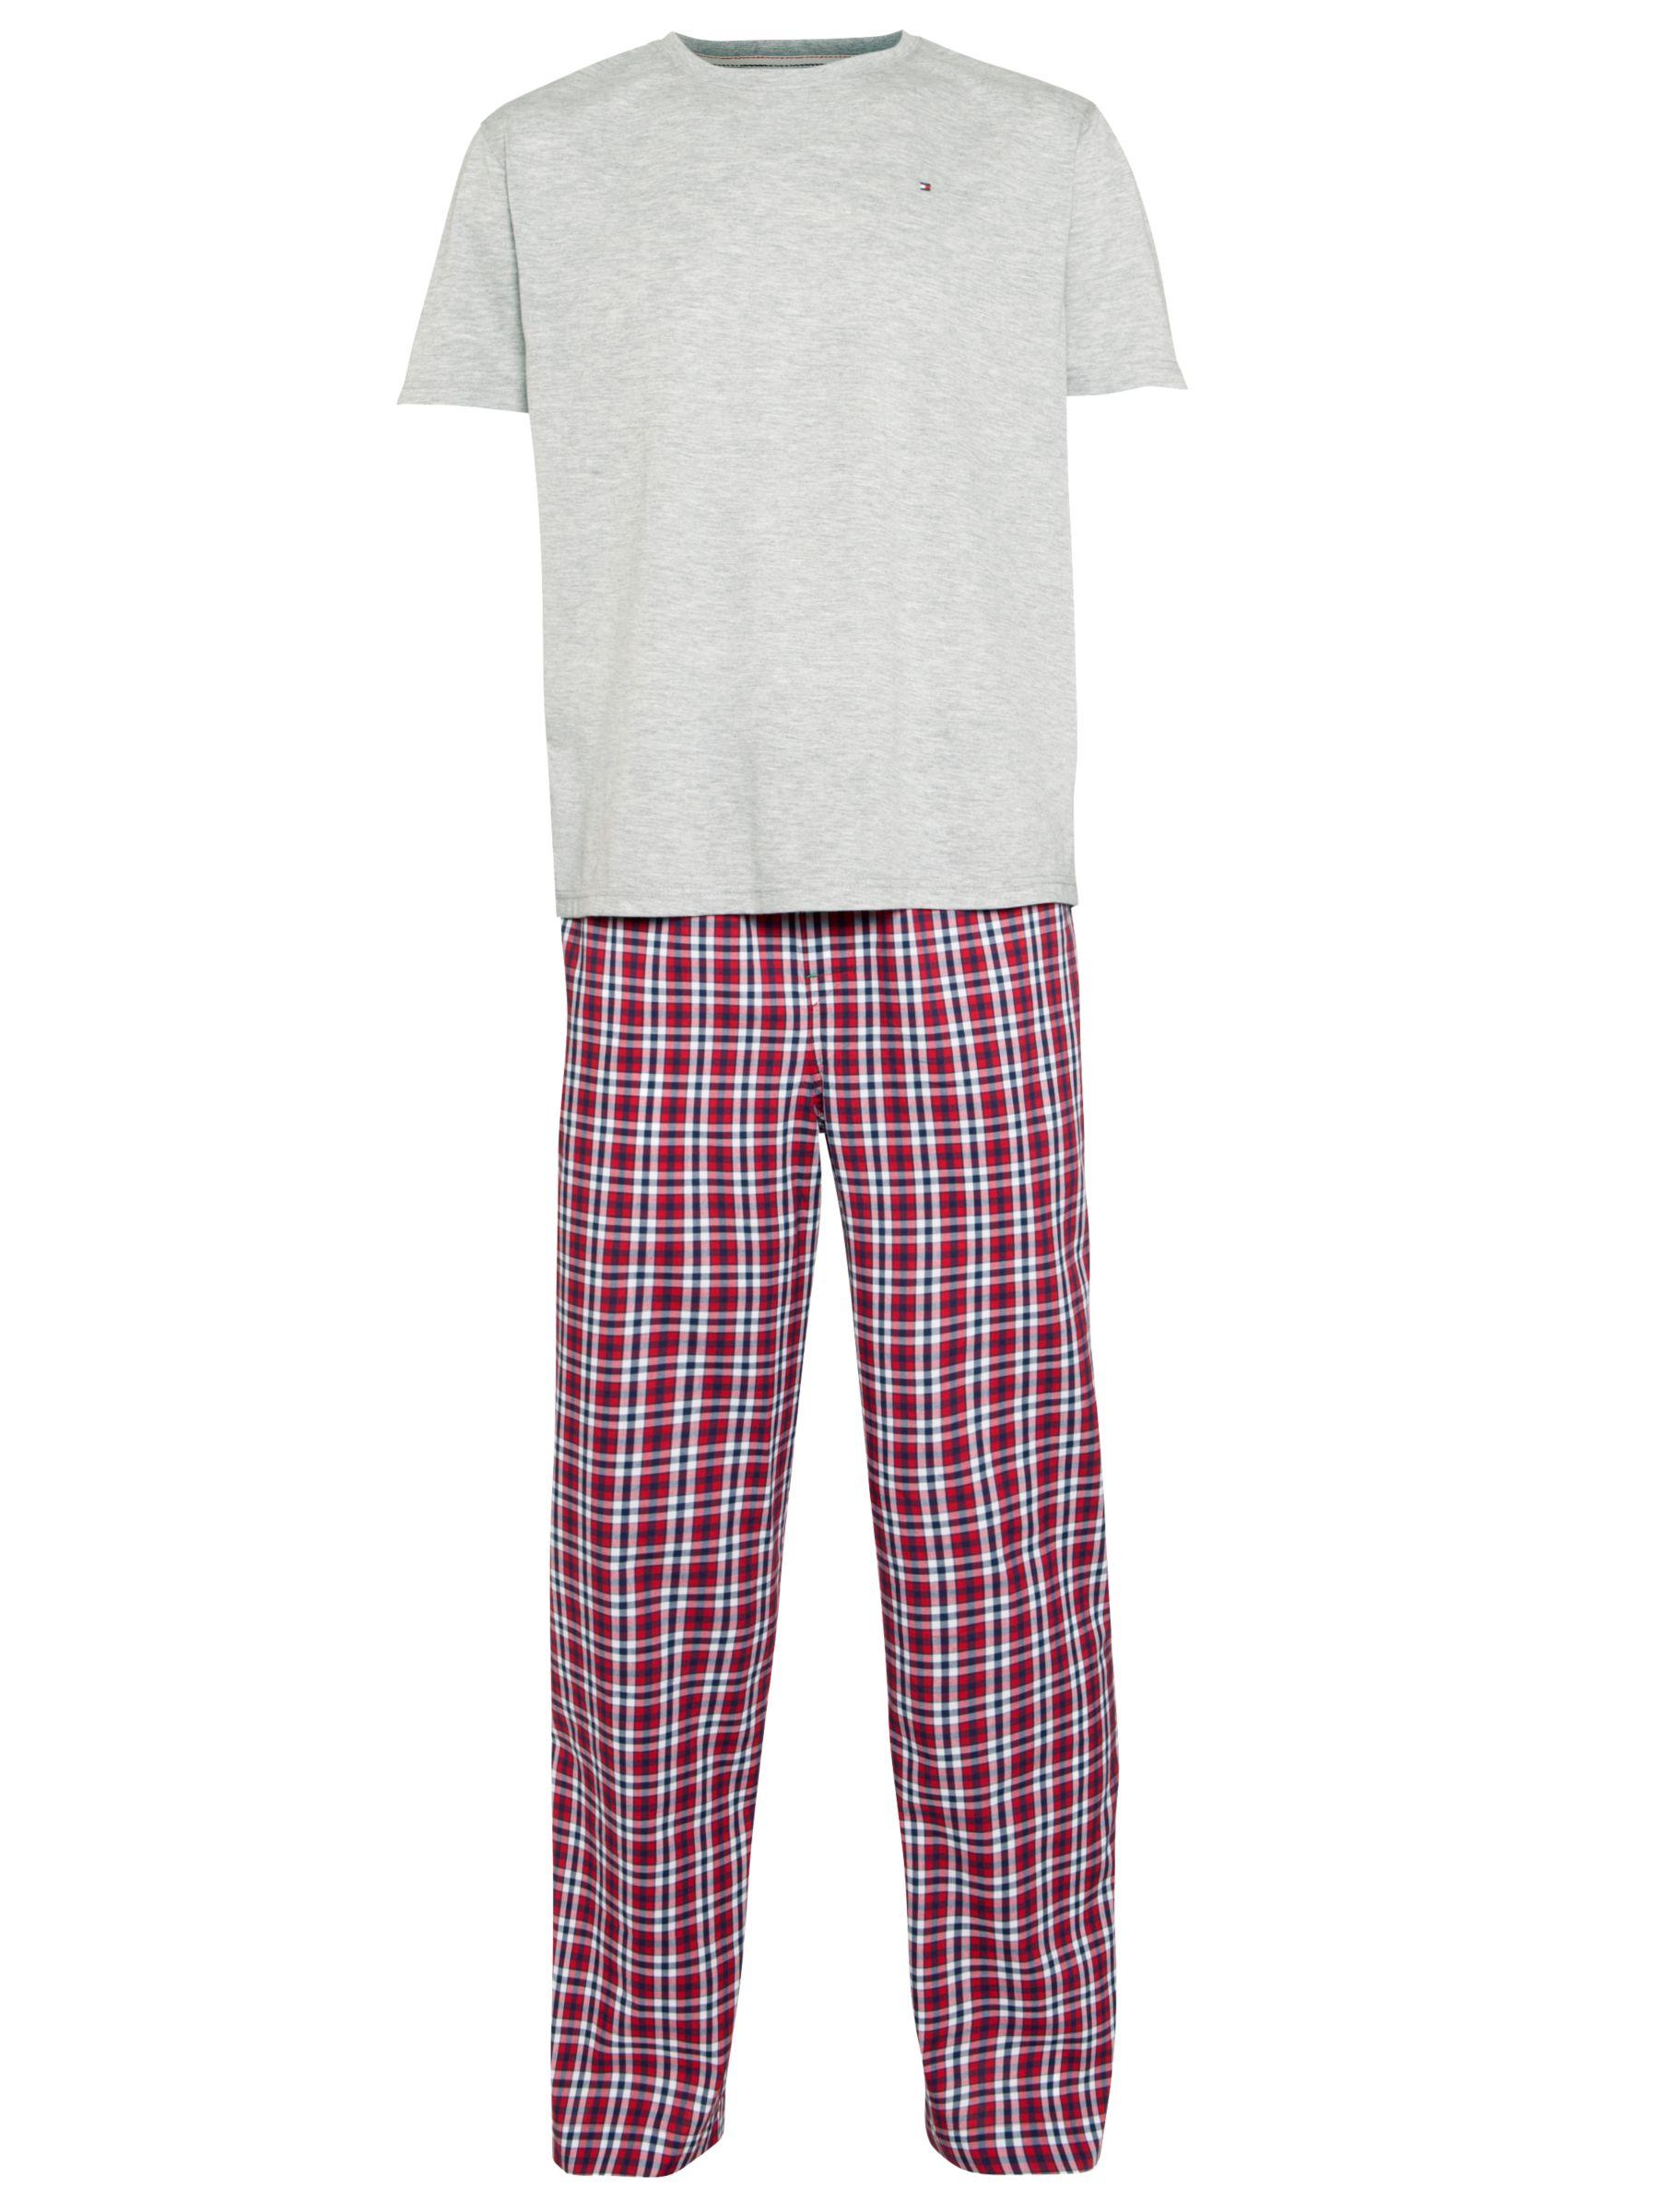 Tommy Hilfiger Gerald Pyjama Set, Grey/Red